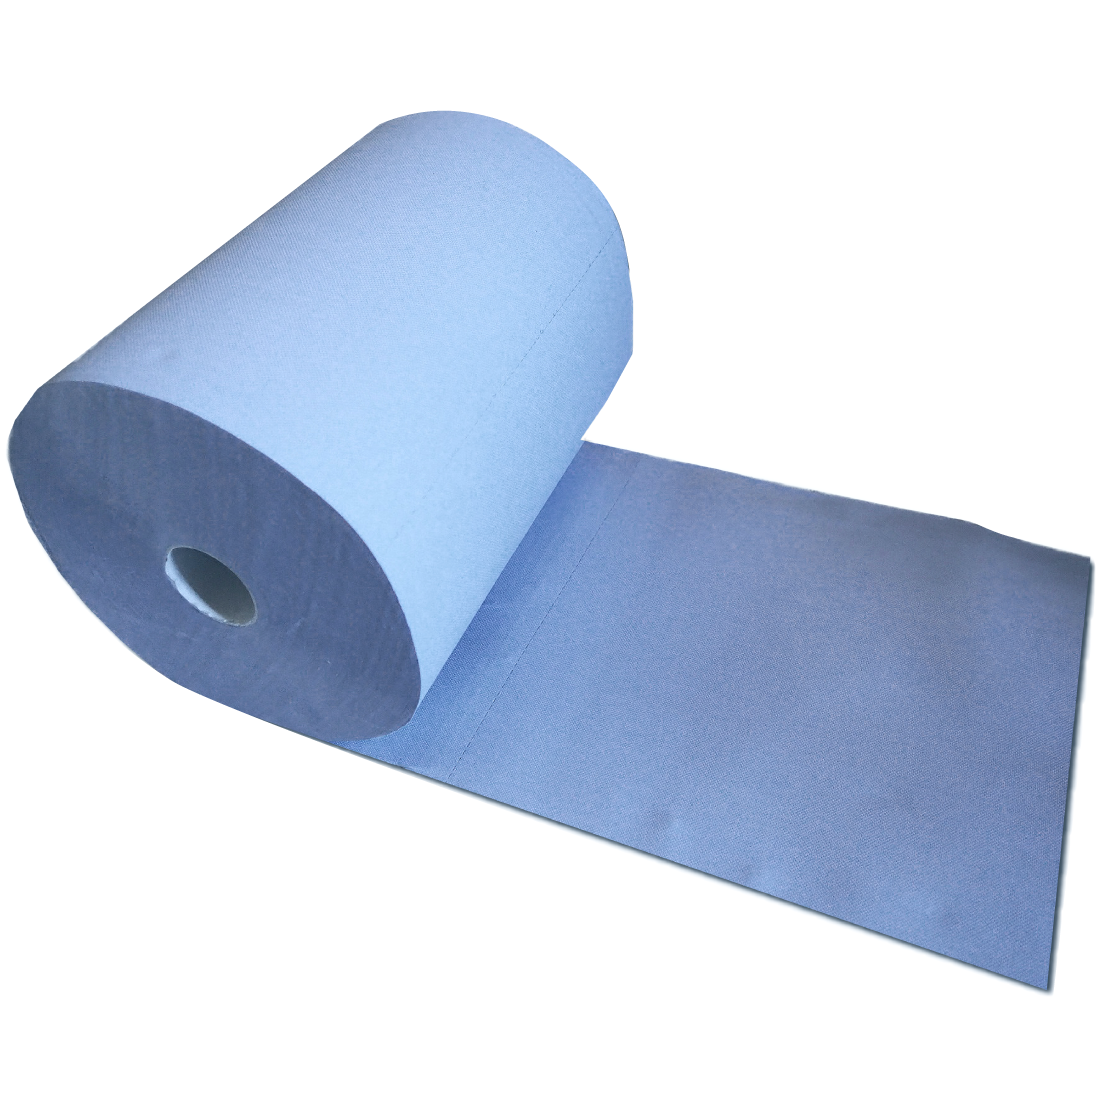 Werkstatt papierrolle